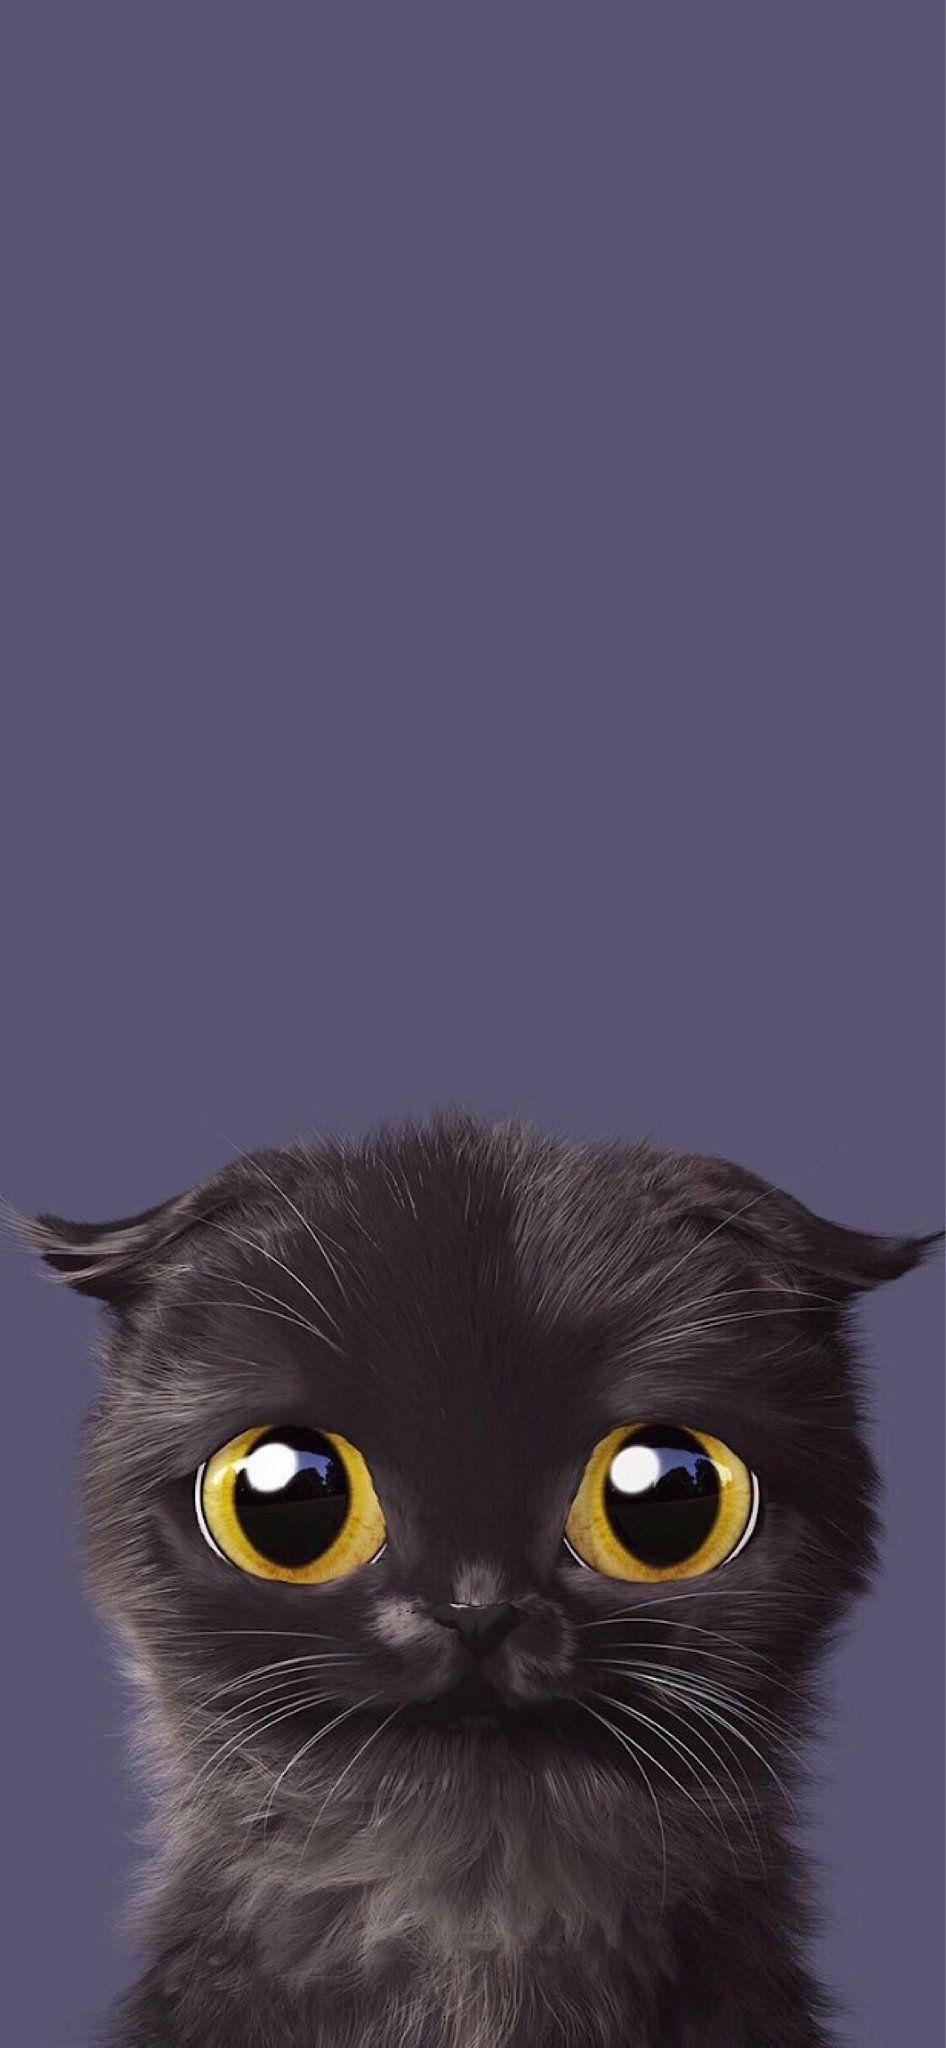 The Iphone X Wallpaper Thread Iphone Ipad Ipod Forums At Imore Com Cat Wallpaper Cute Cat Wallpaper Animal Wallpaper